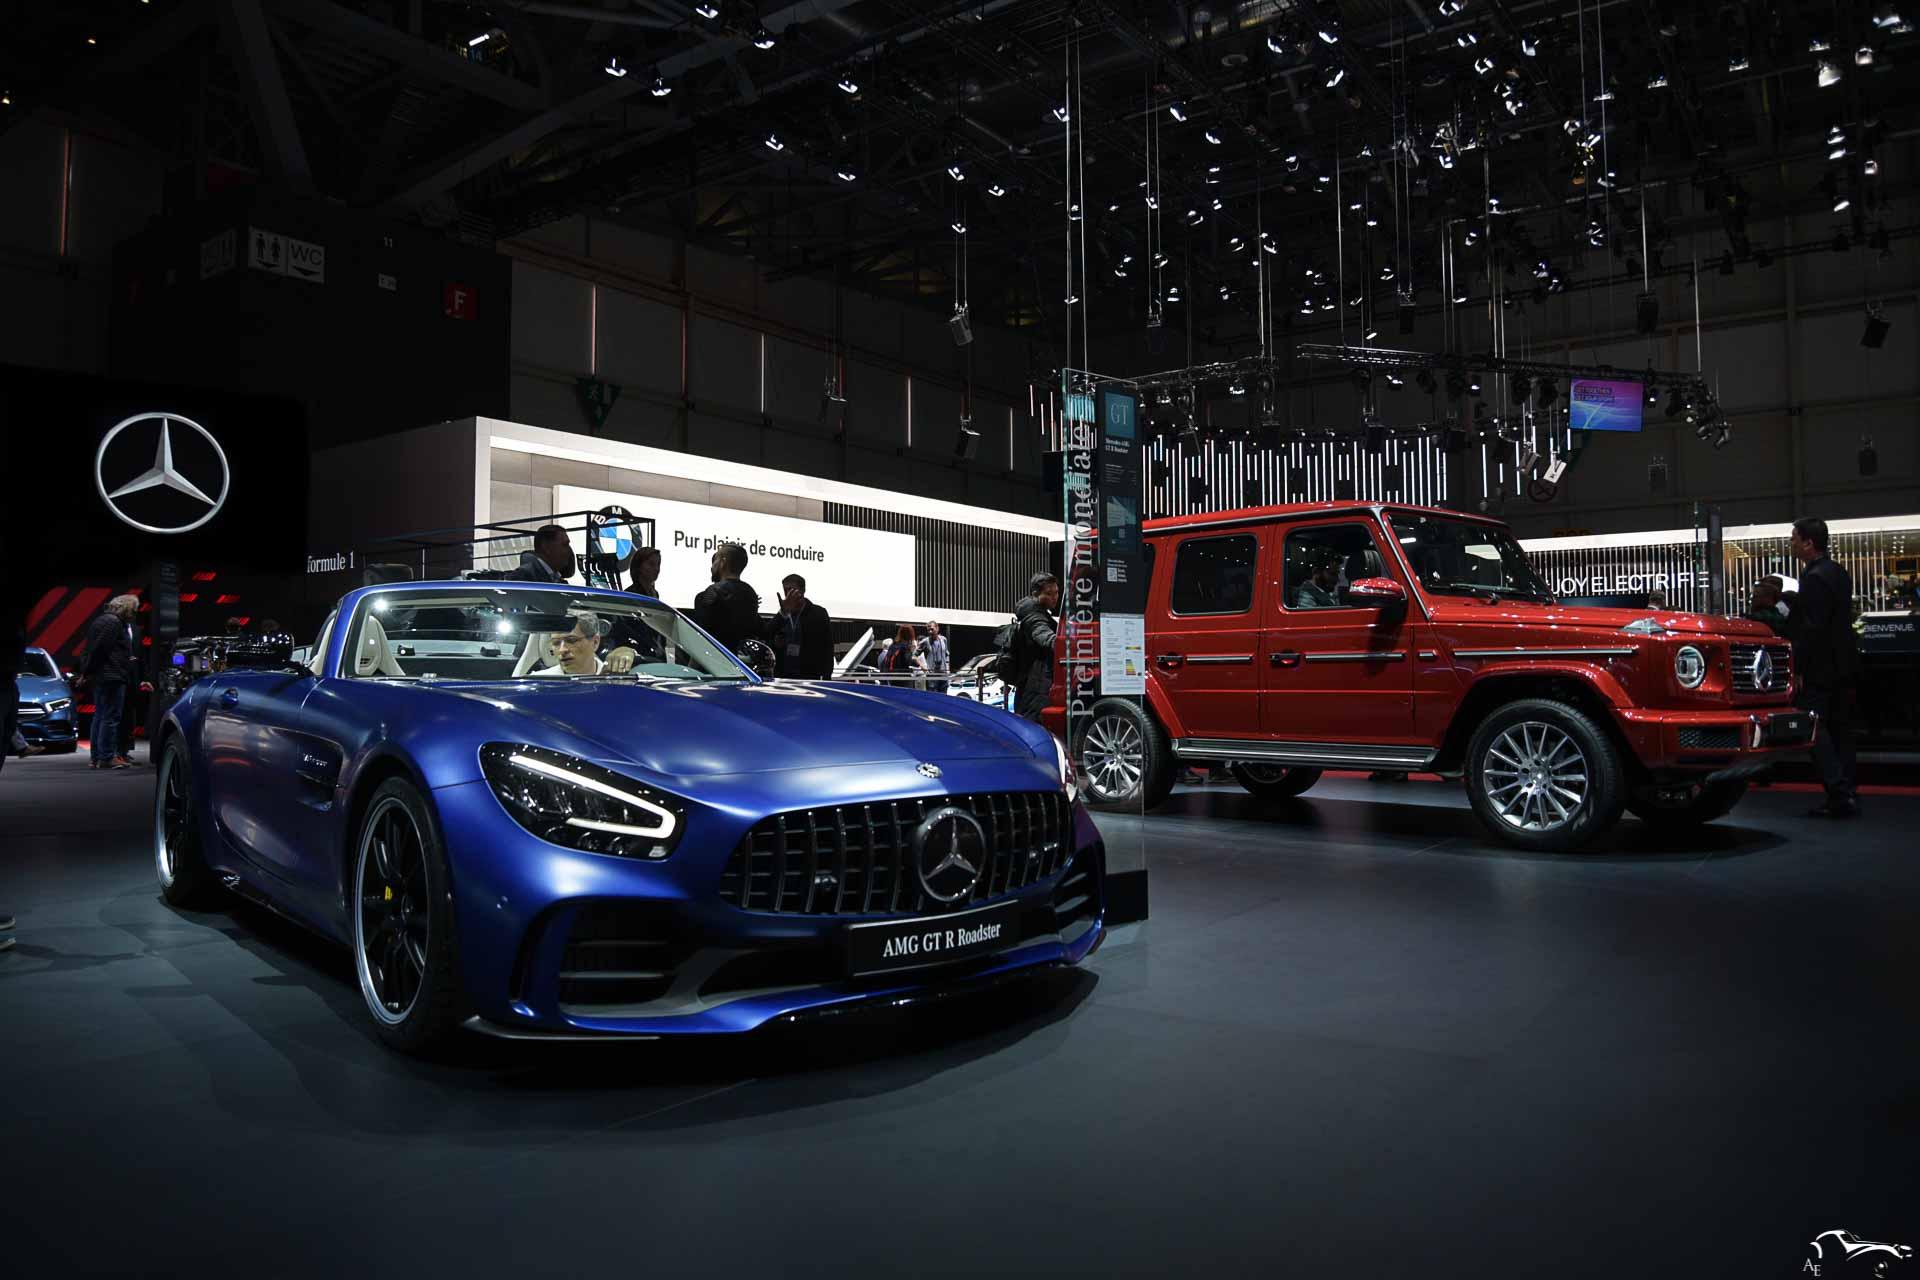 Merceds-Benz AMG GT-R & G